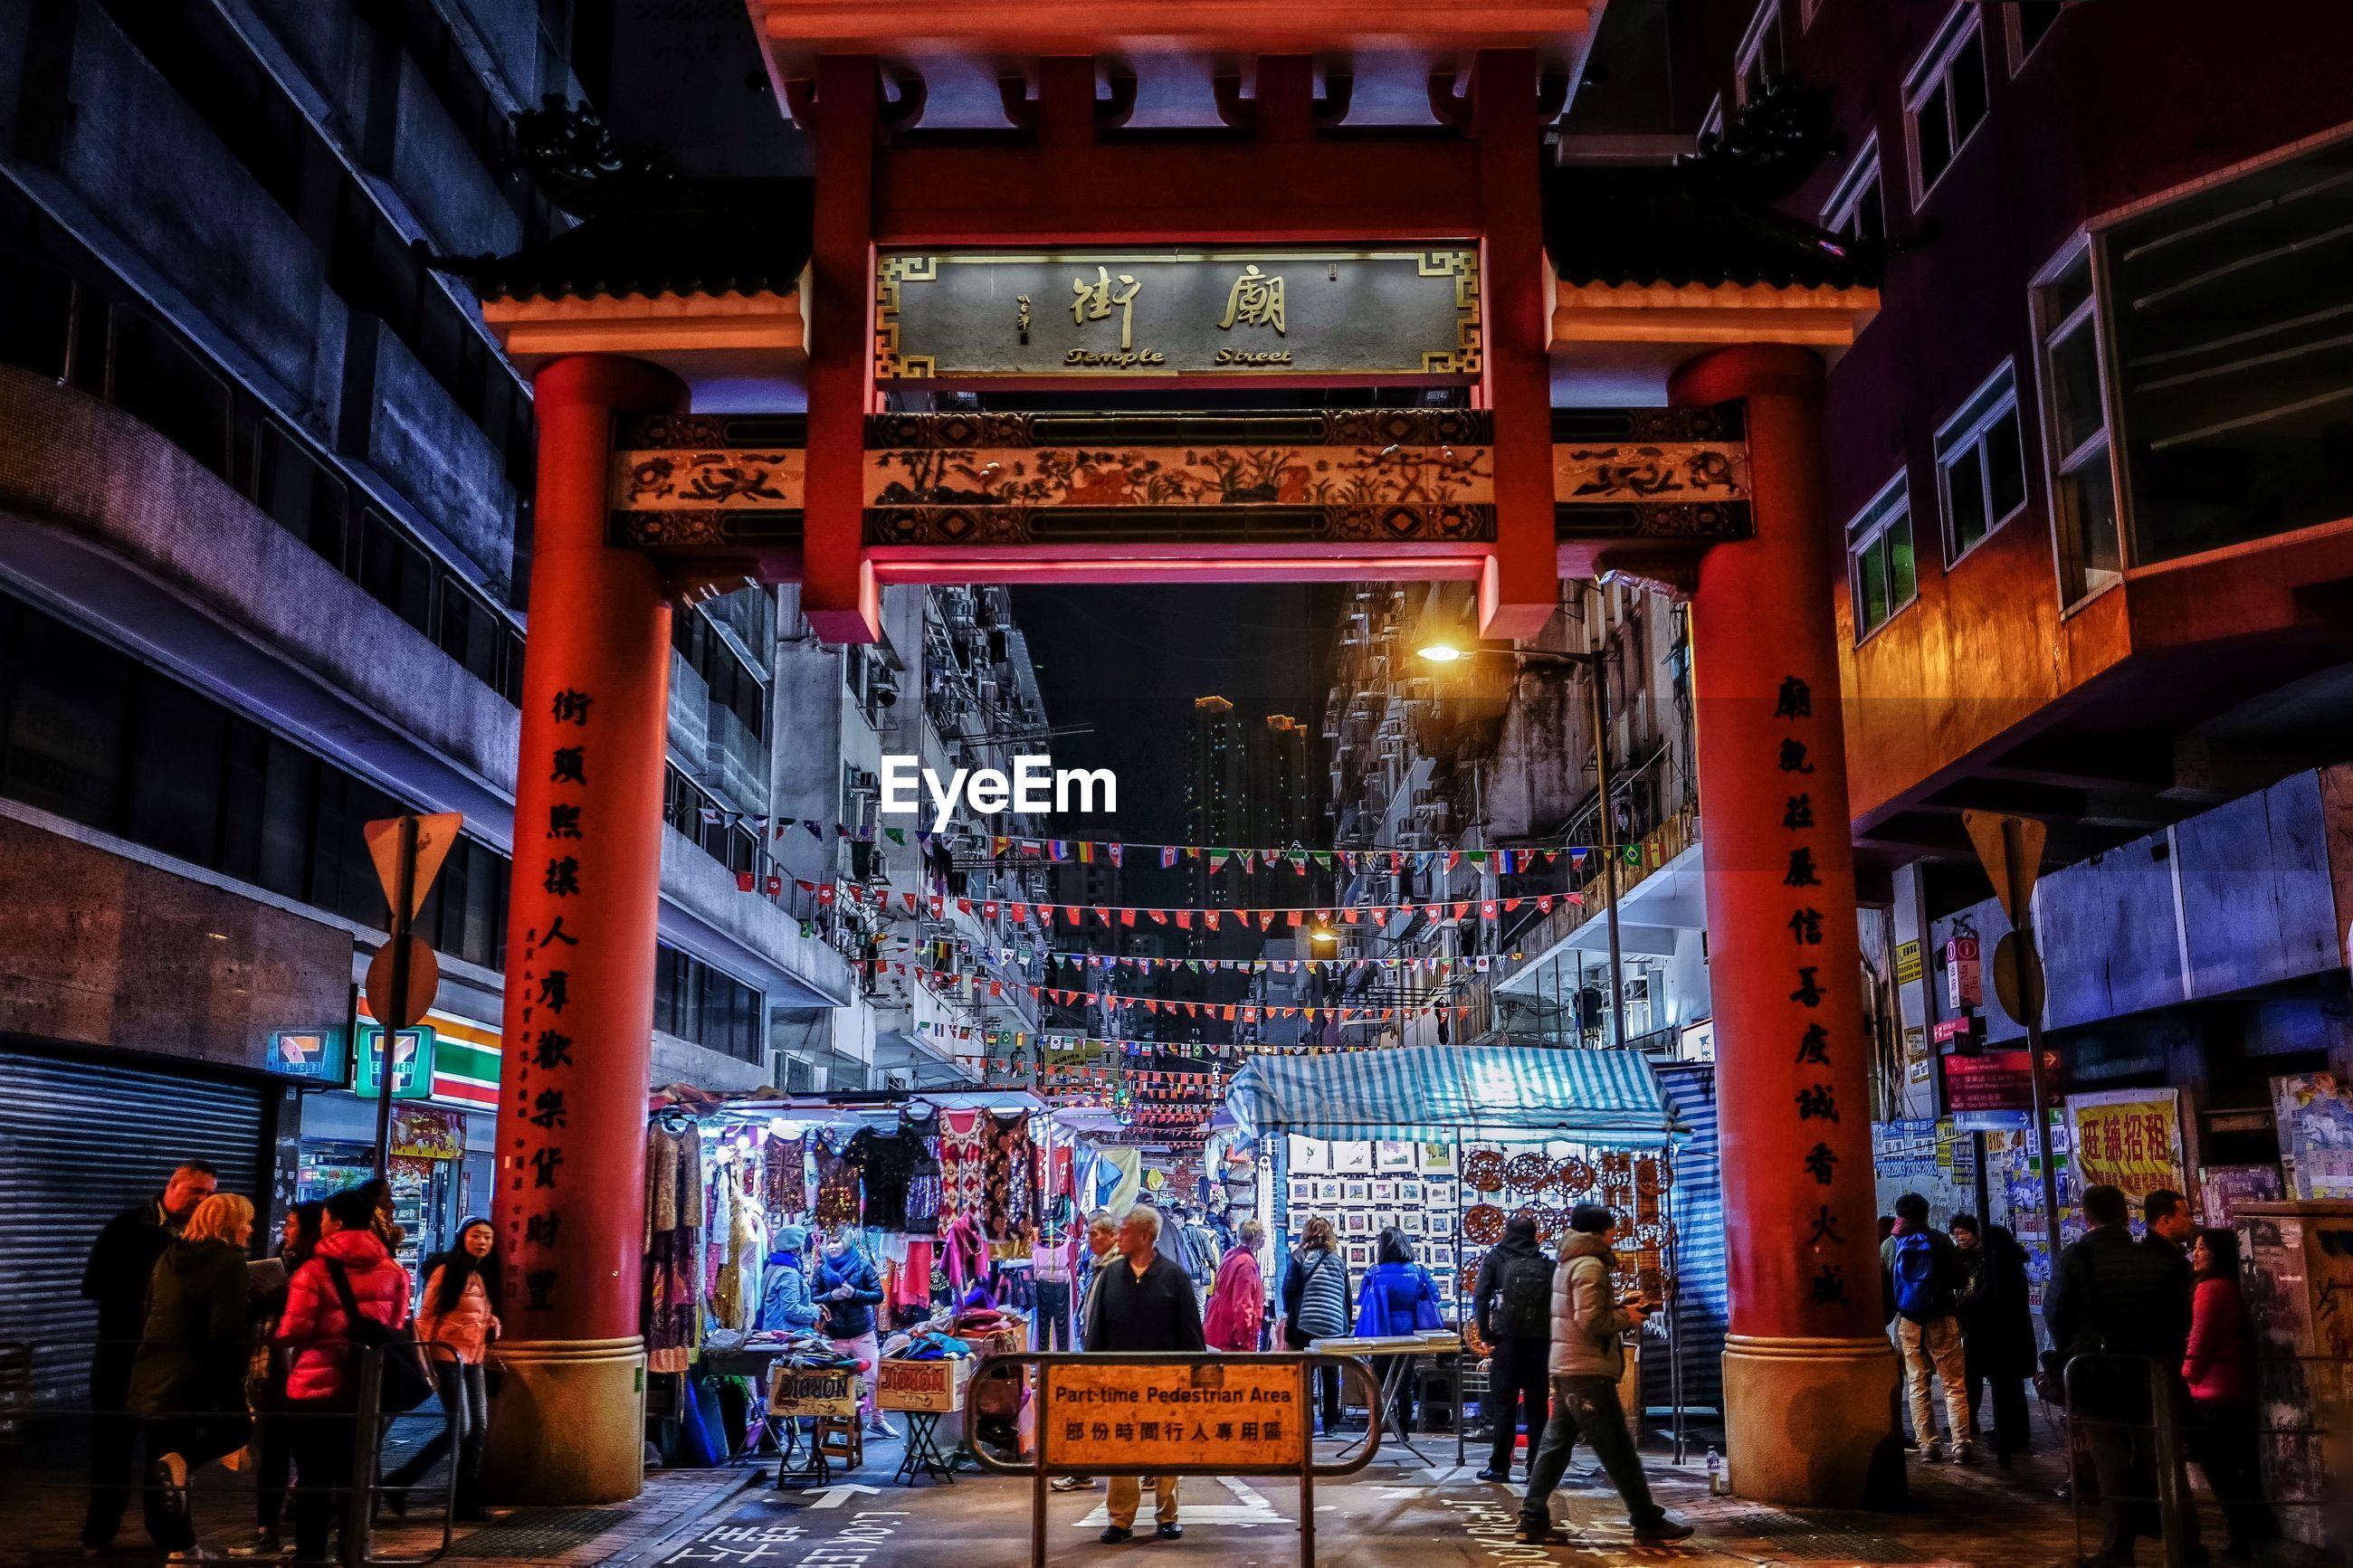 People at illuminated city street with torii gate